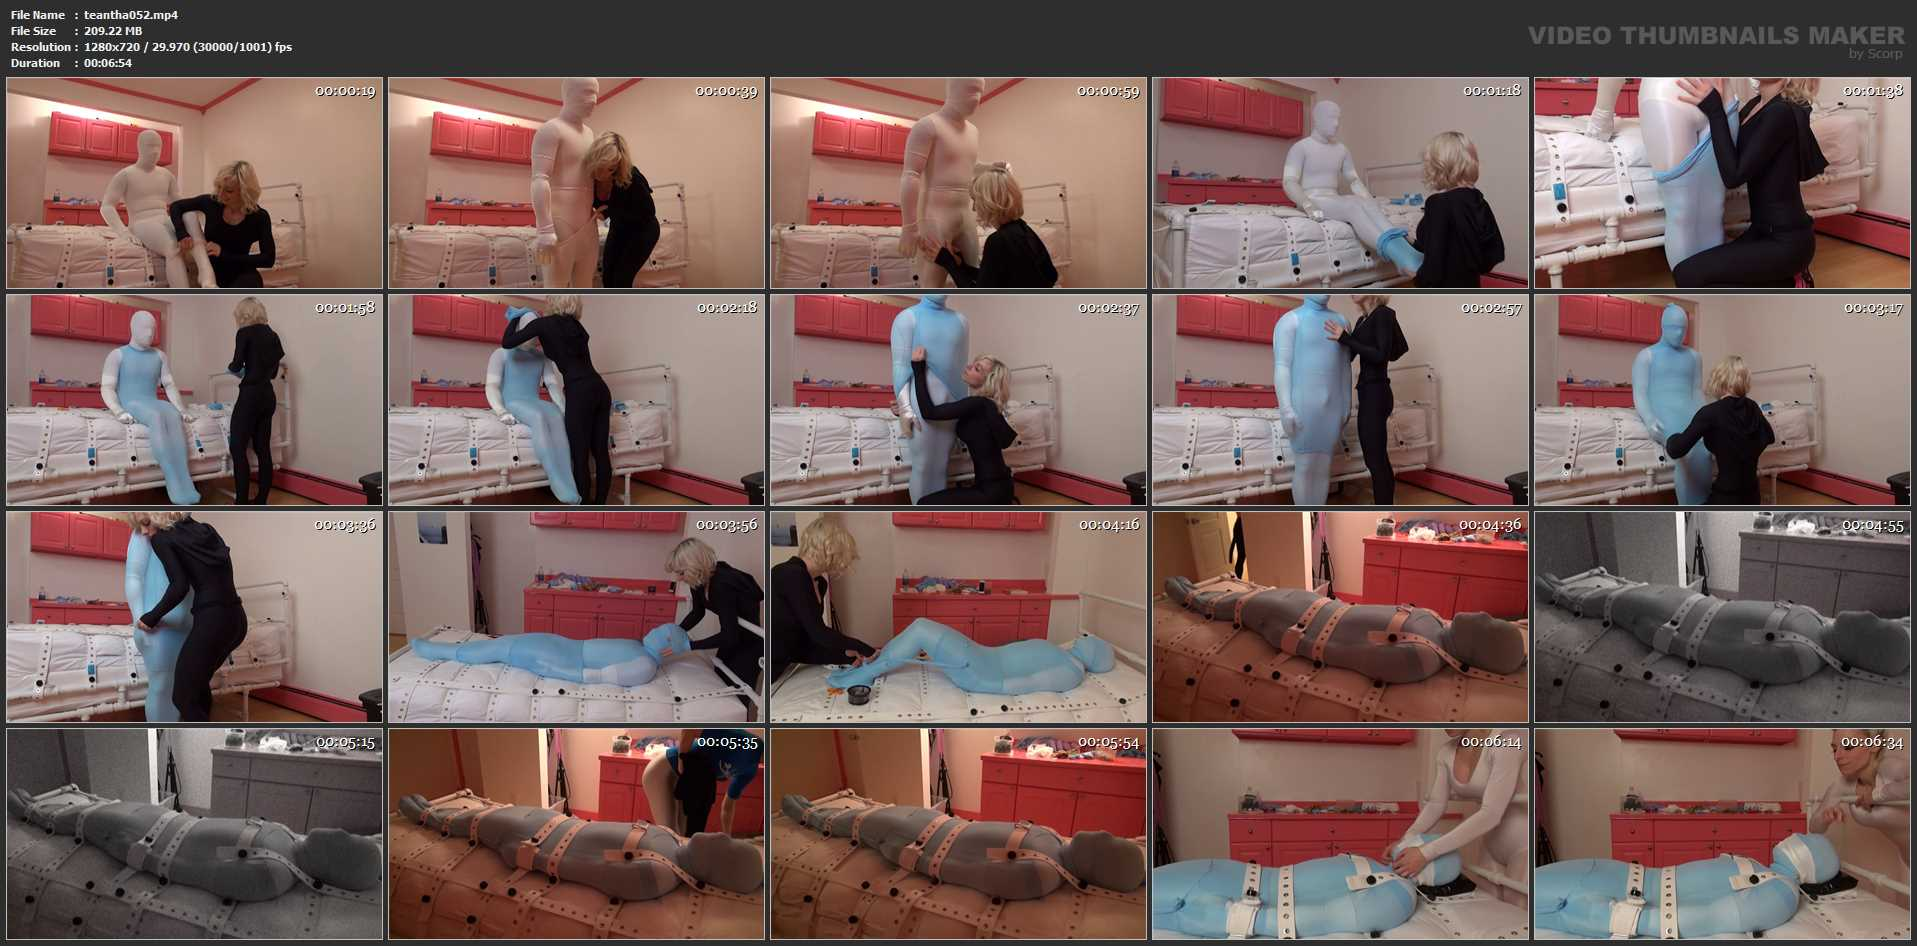 Christina QCCP In Scene: Encasement Addict Test, I could squeeze him - TEASEANDTHANKYOU - HD/720p/MP4